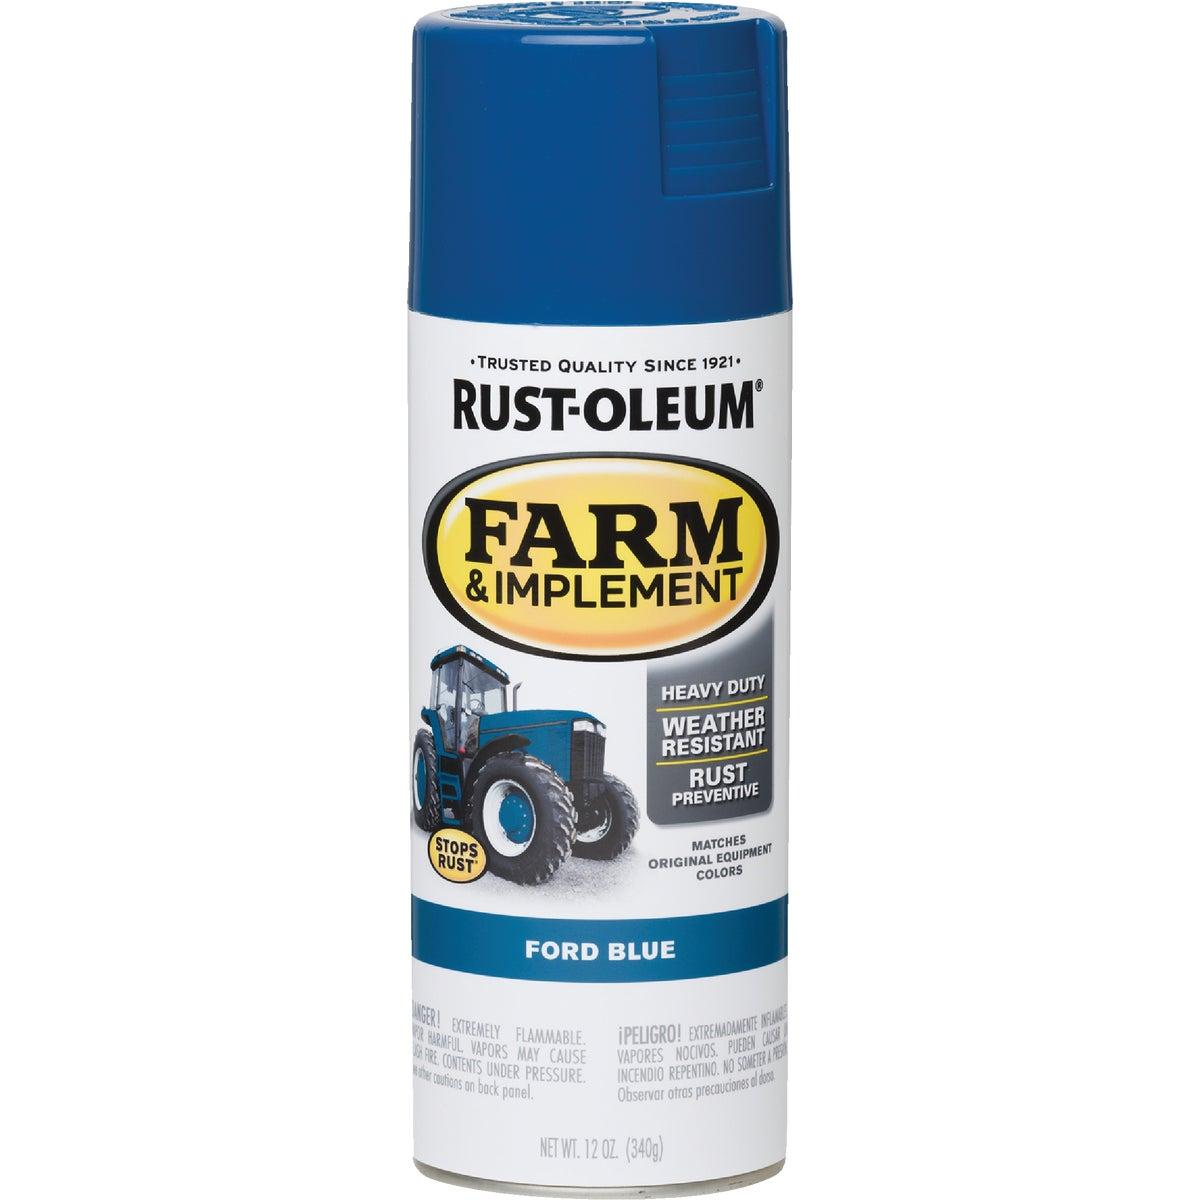 Rust Oleum FORD BLUE SPRAY PAINT 7424-830